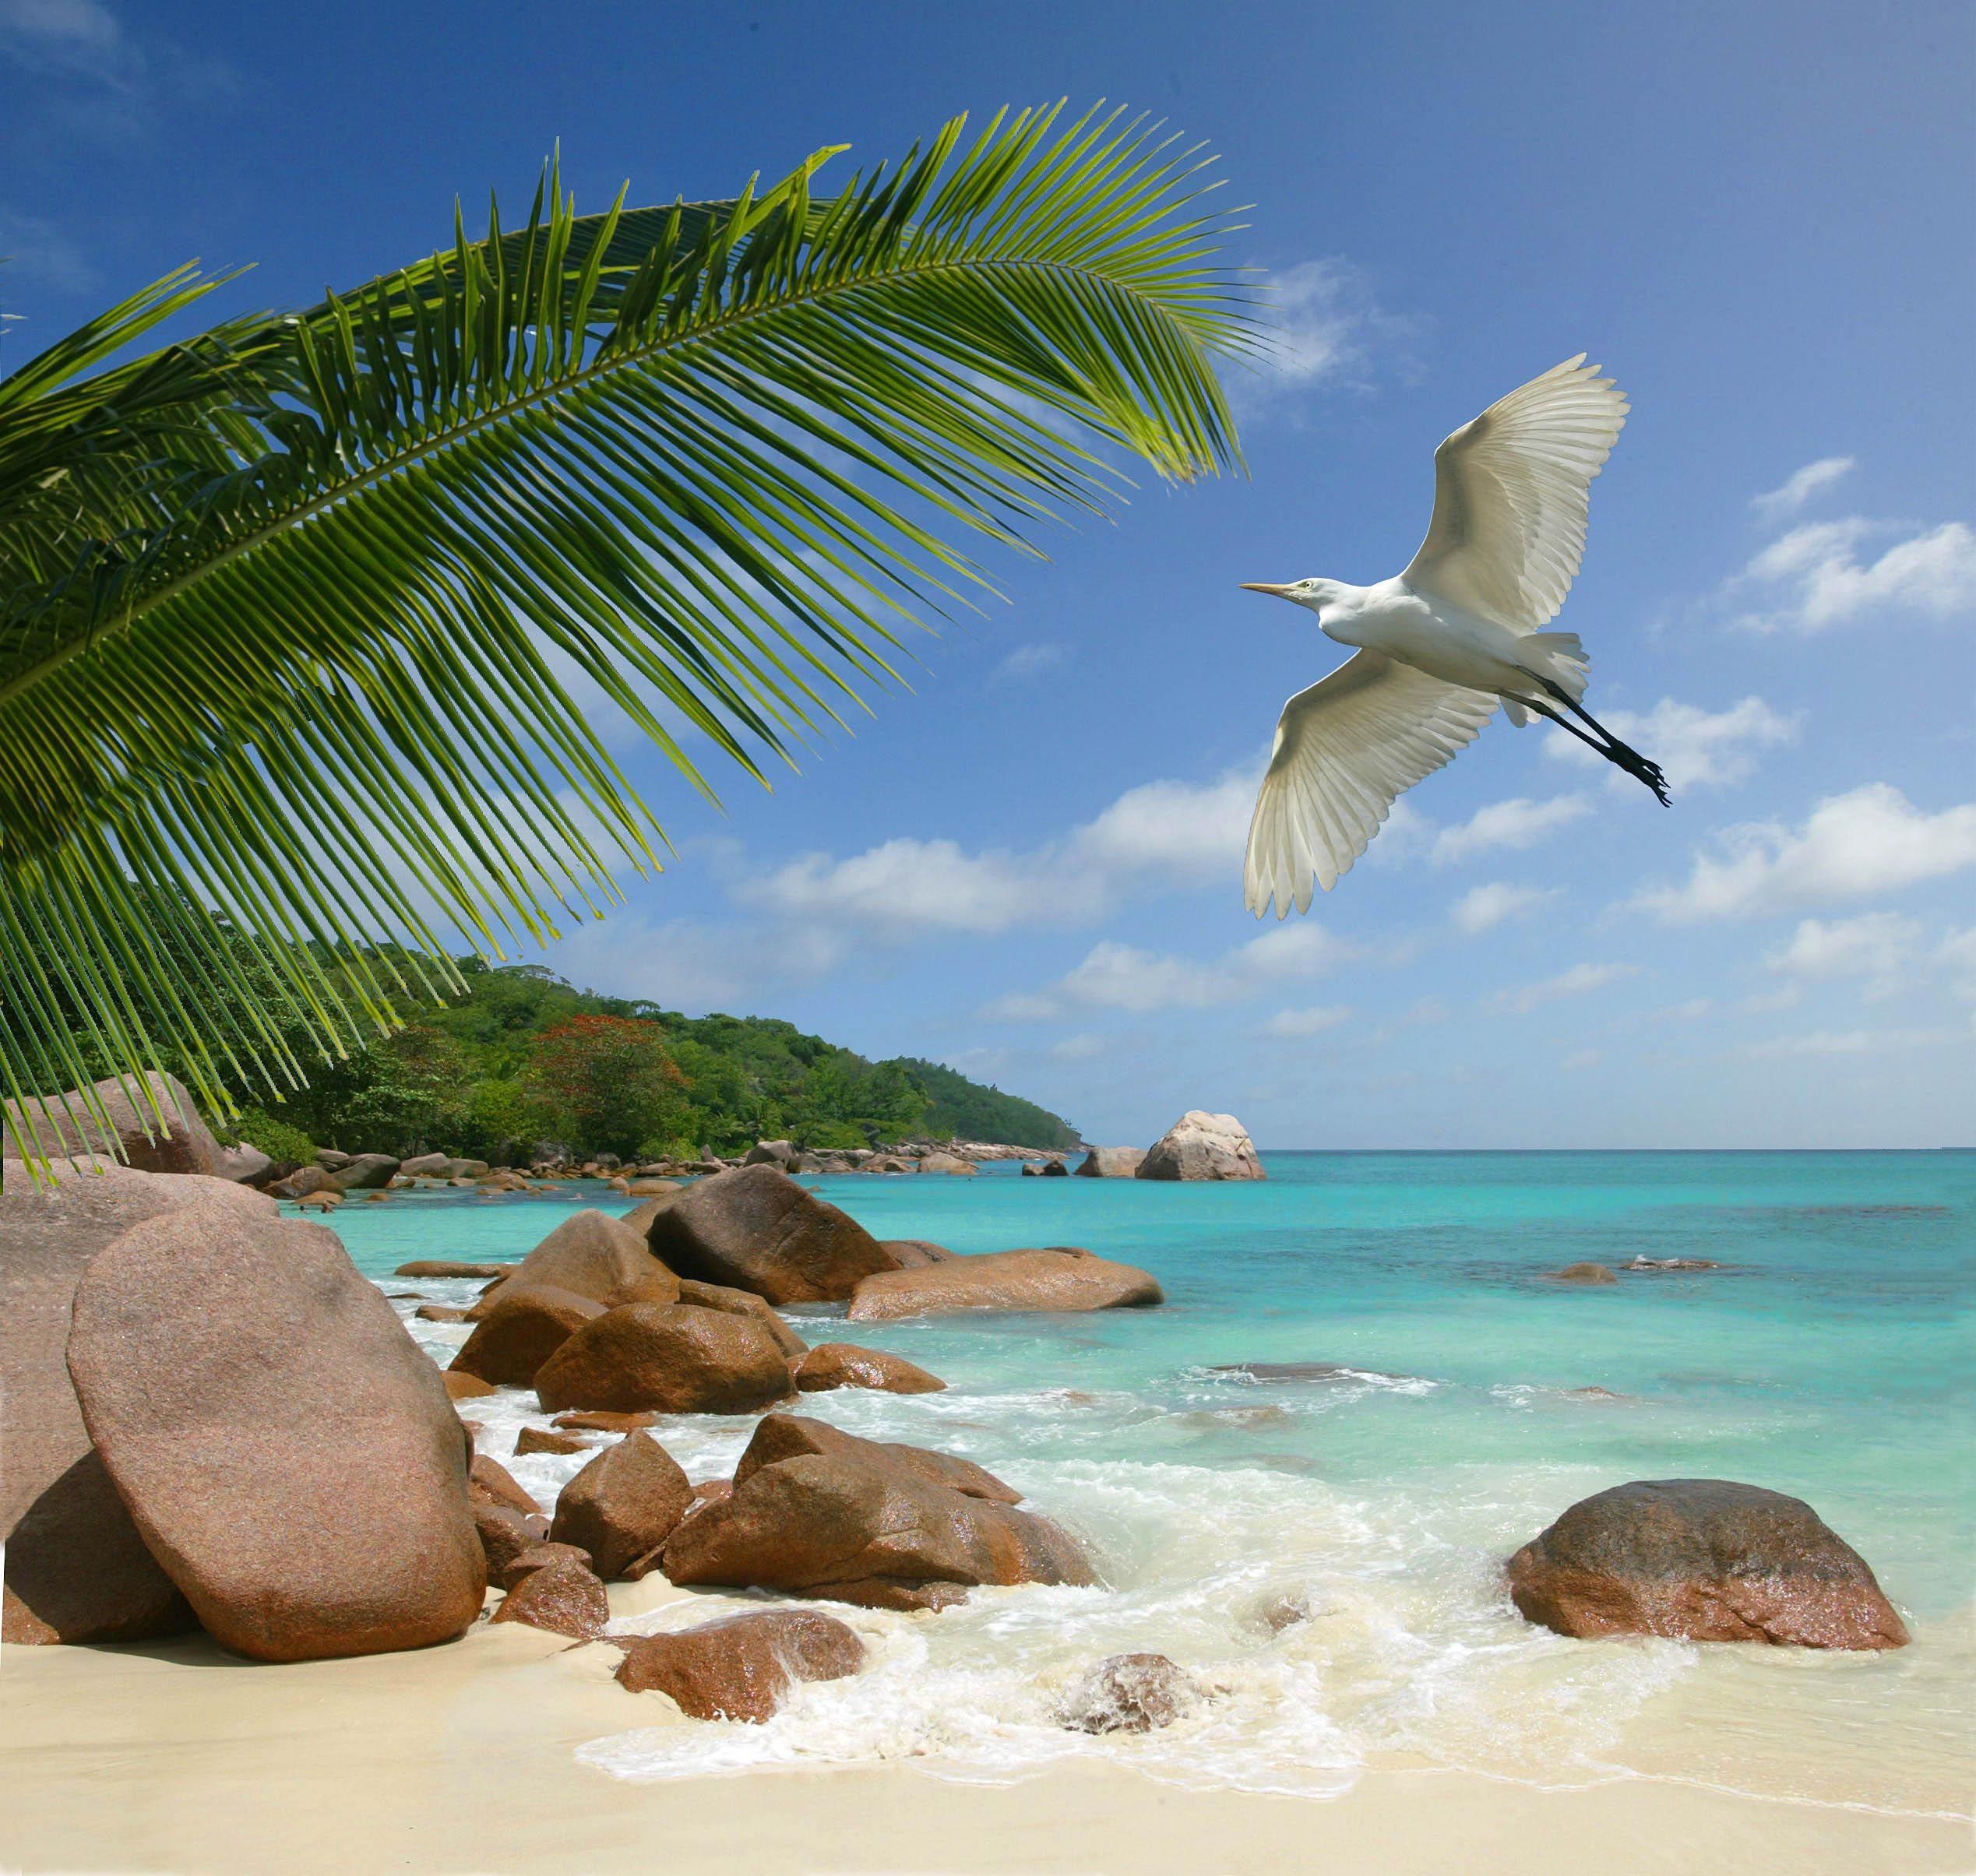 voyage algerie seychelles